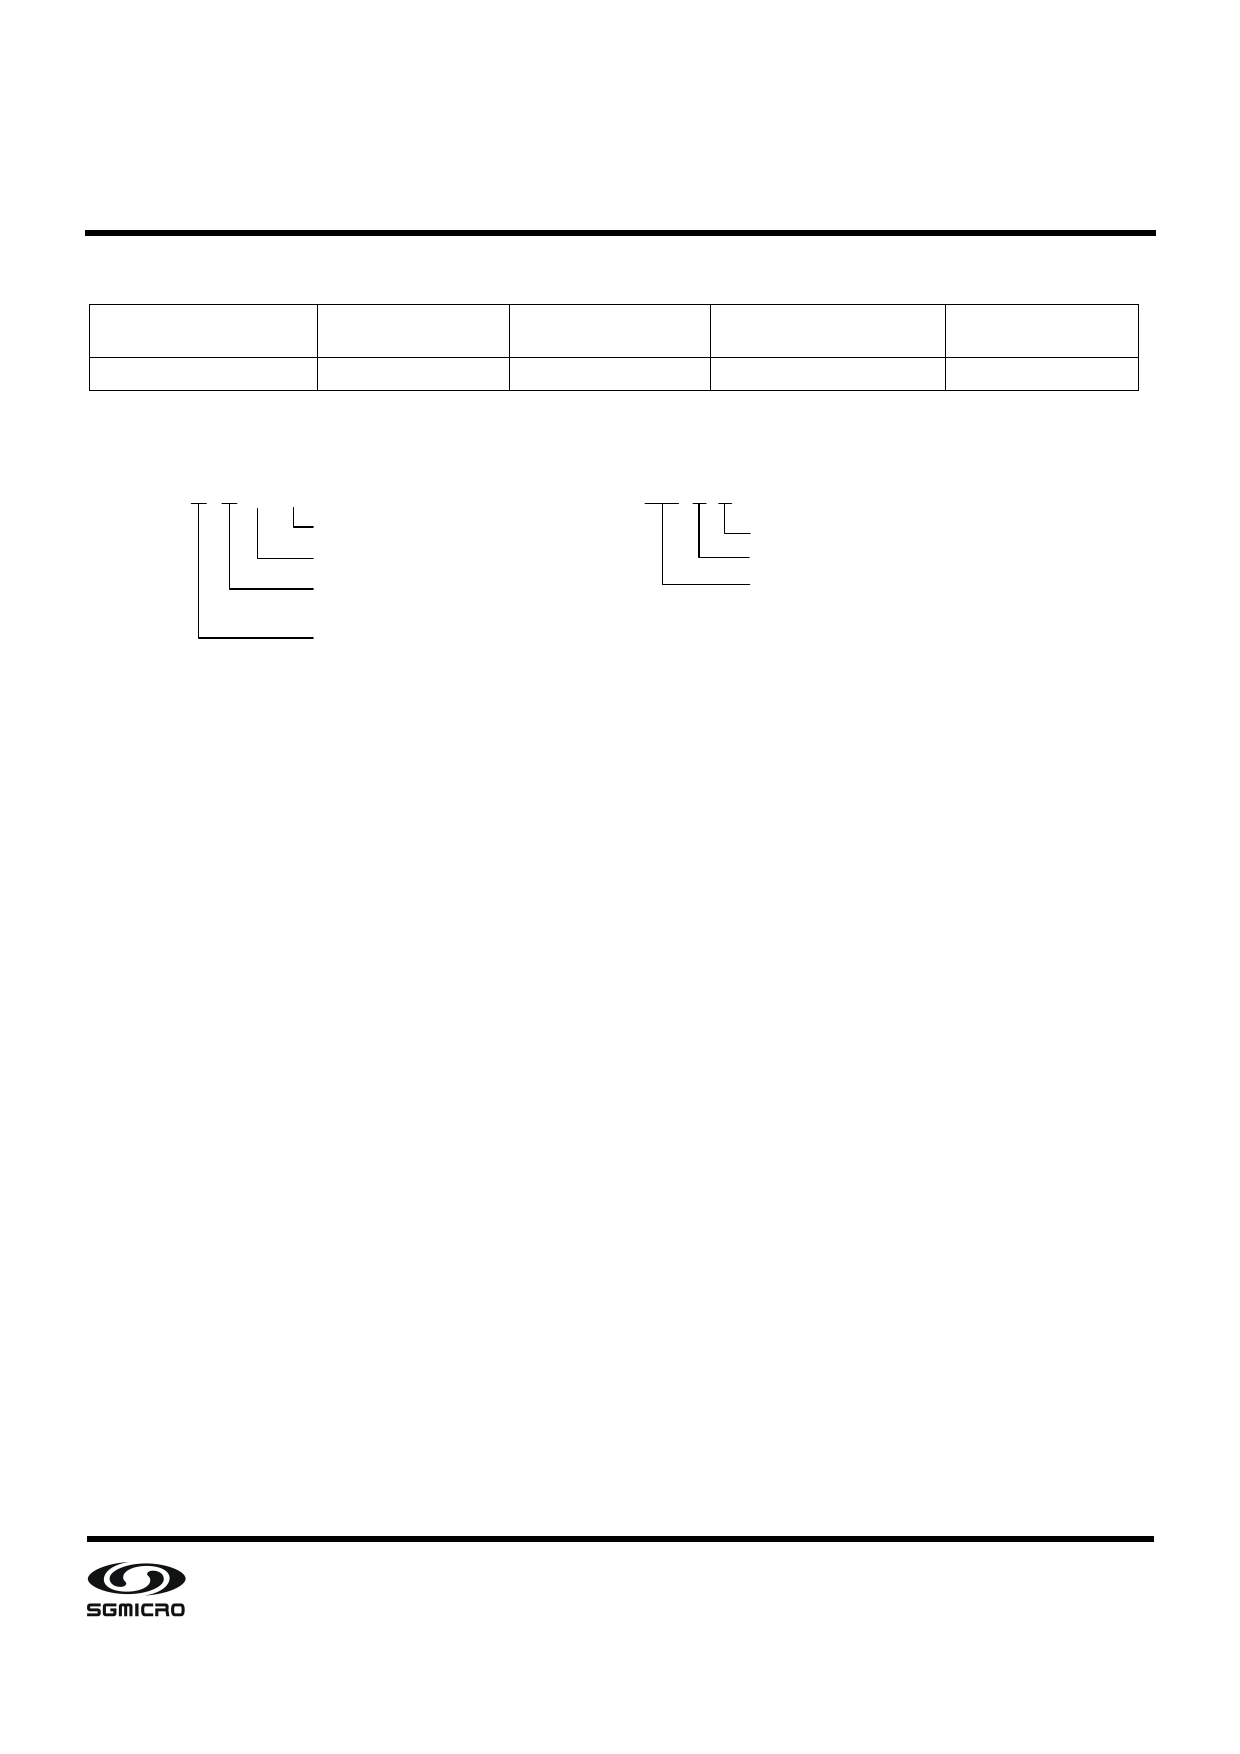 SGM9114 pdf, schematic